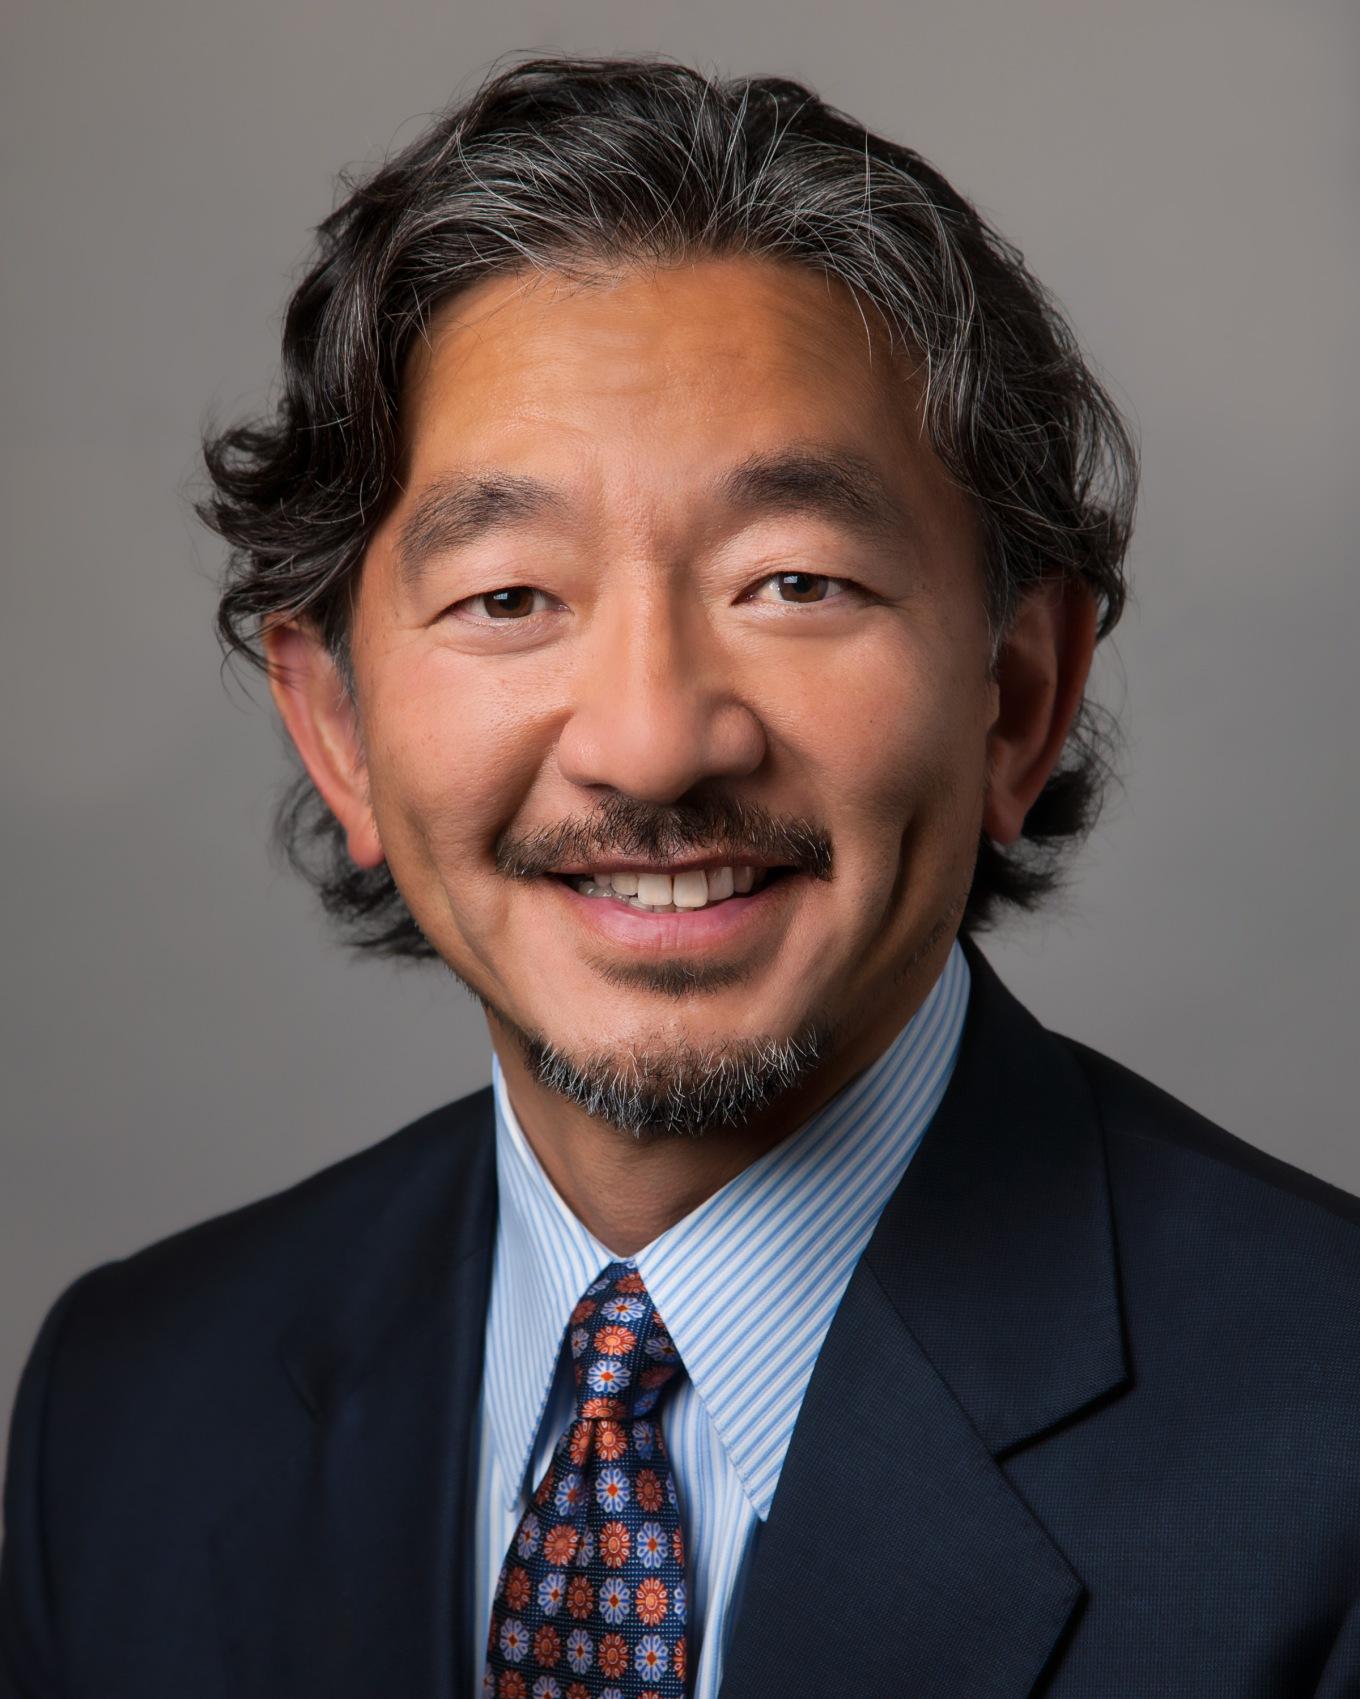 A head shot of Department of Transportation Director Harold Taniguchi.